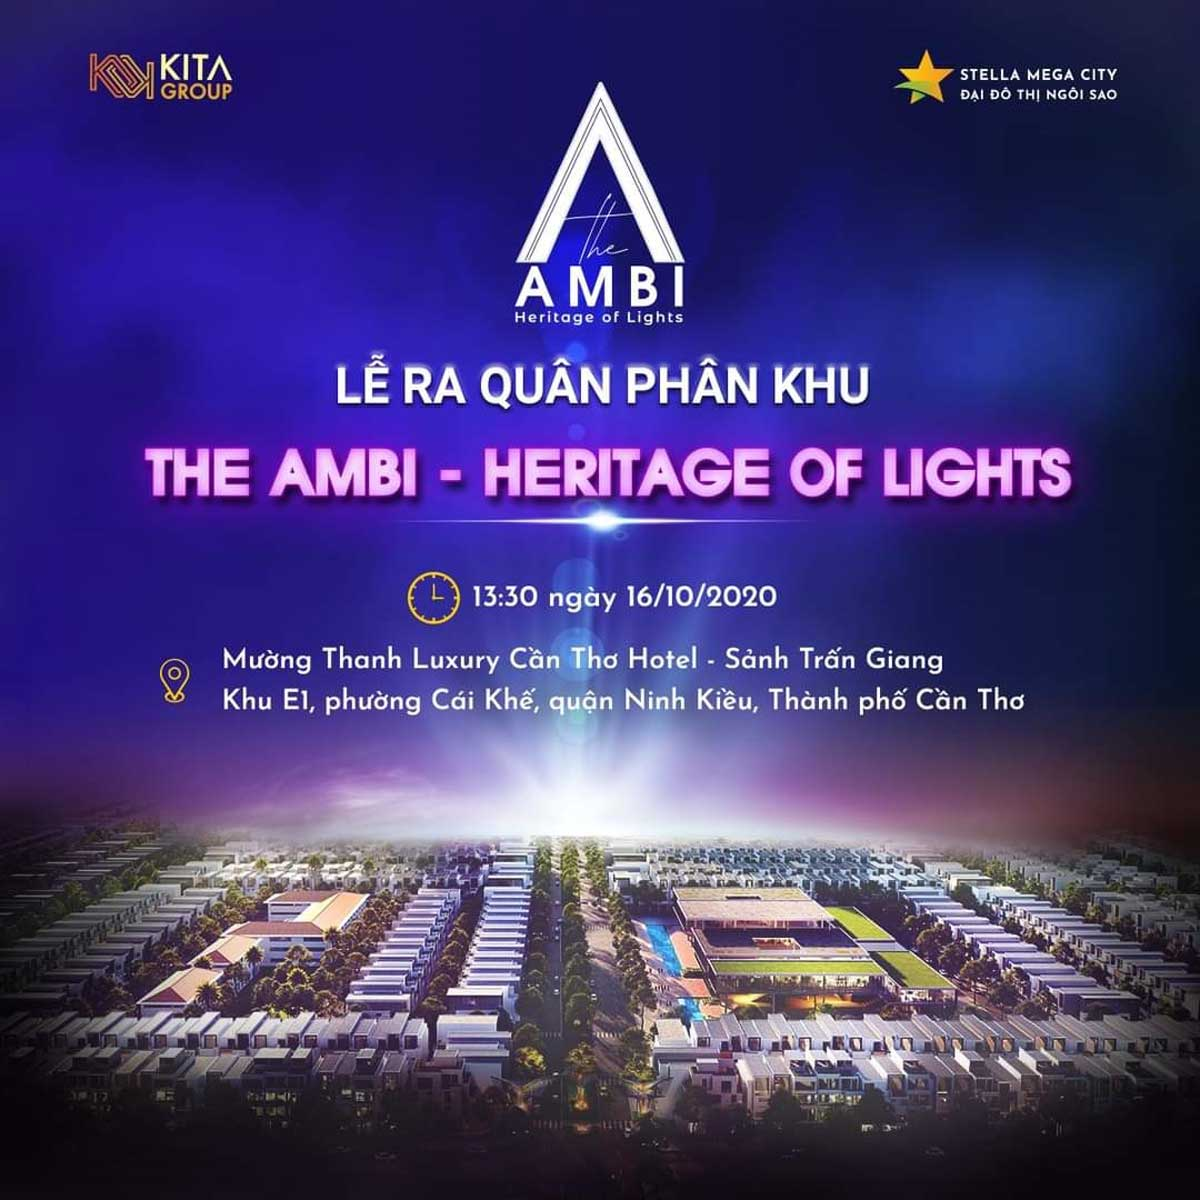 The Ambi - Heritage of Lights